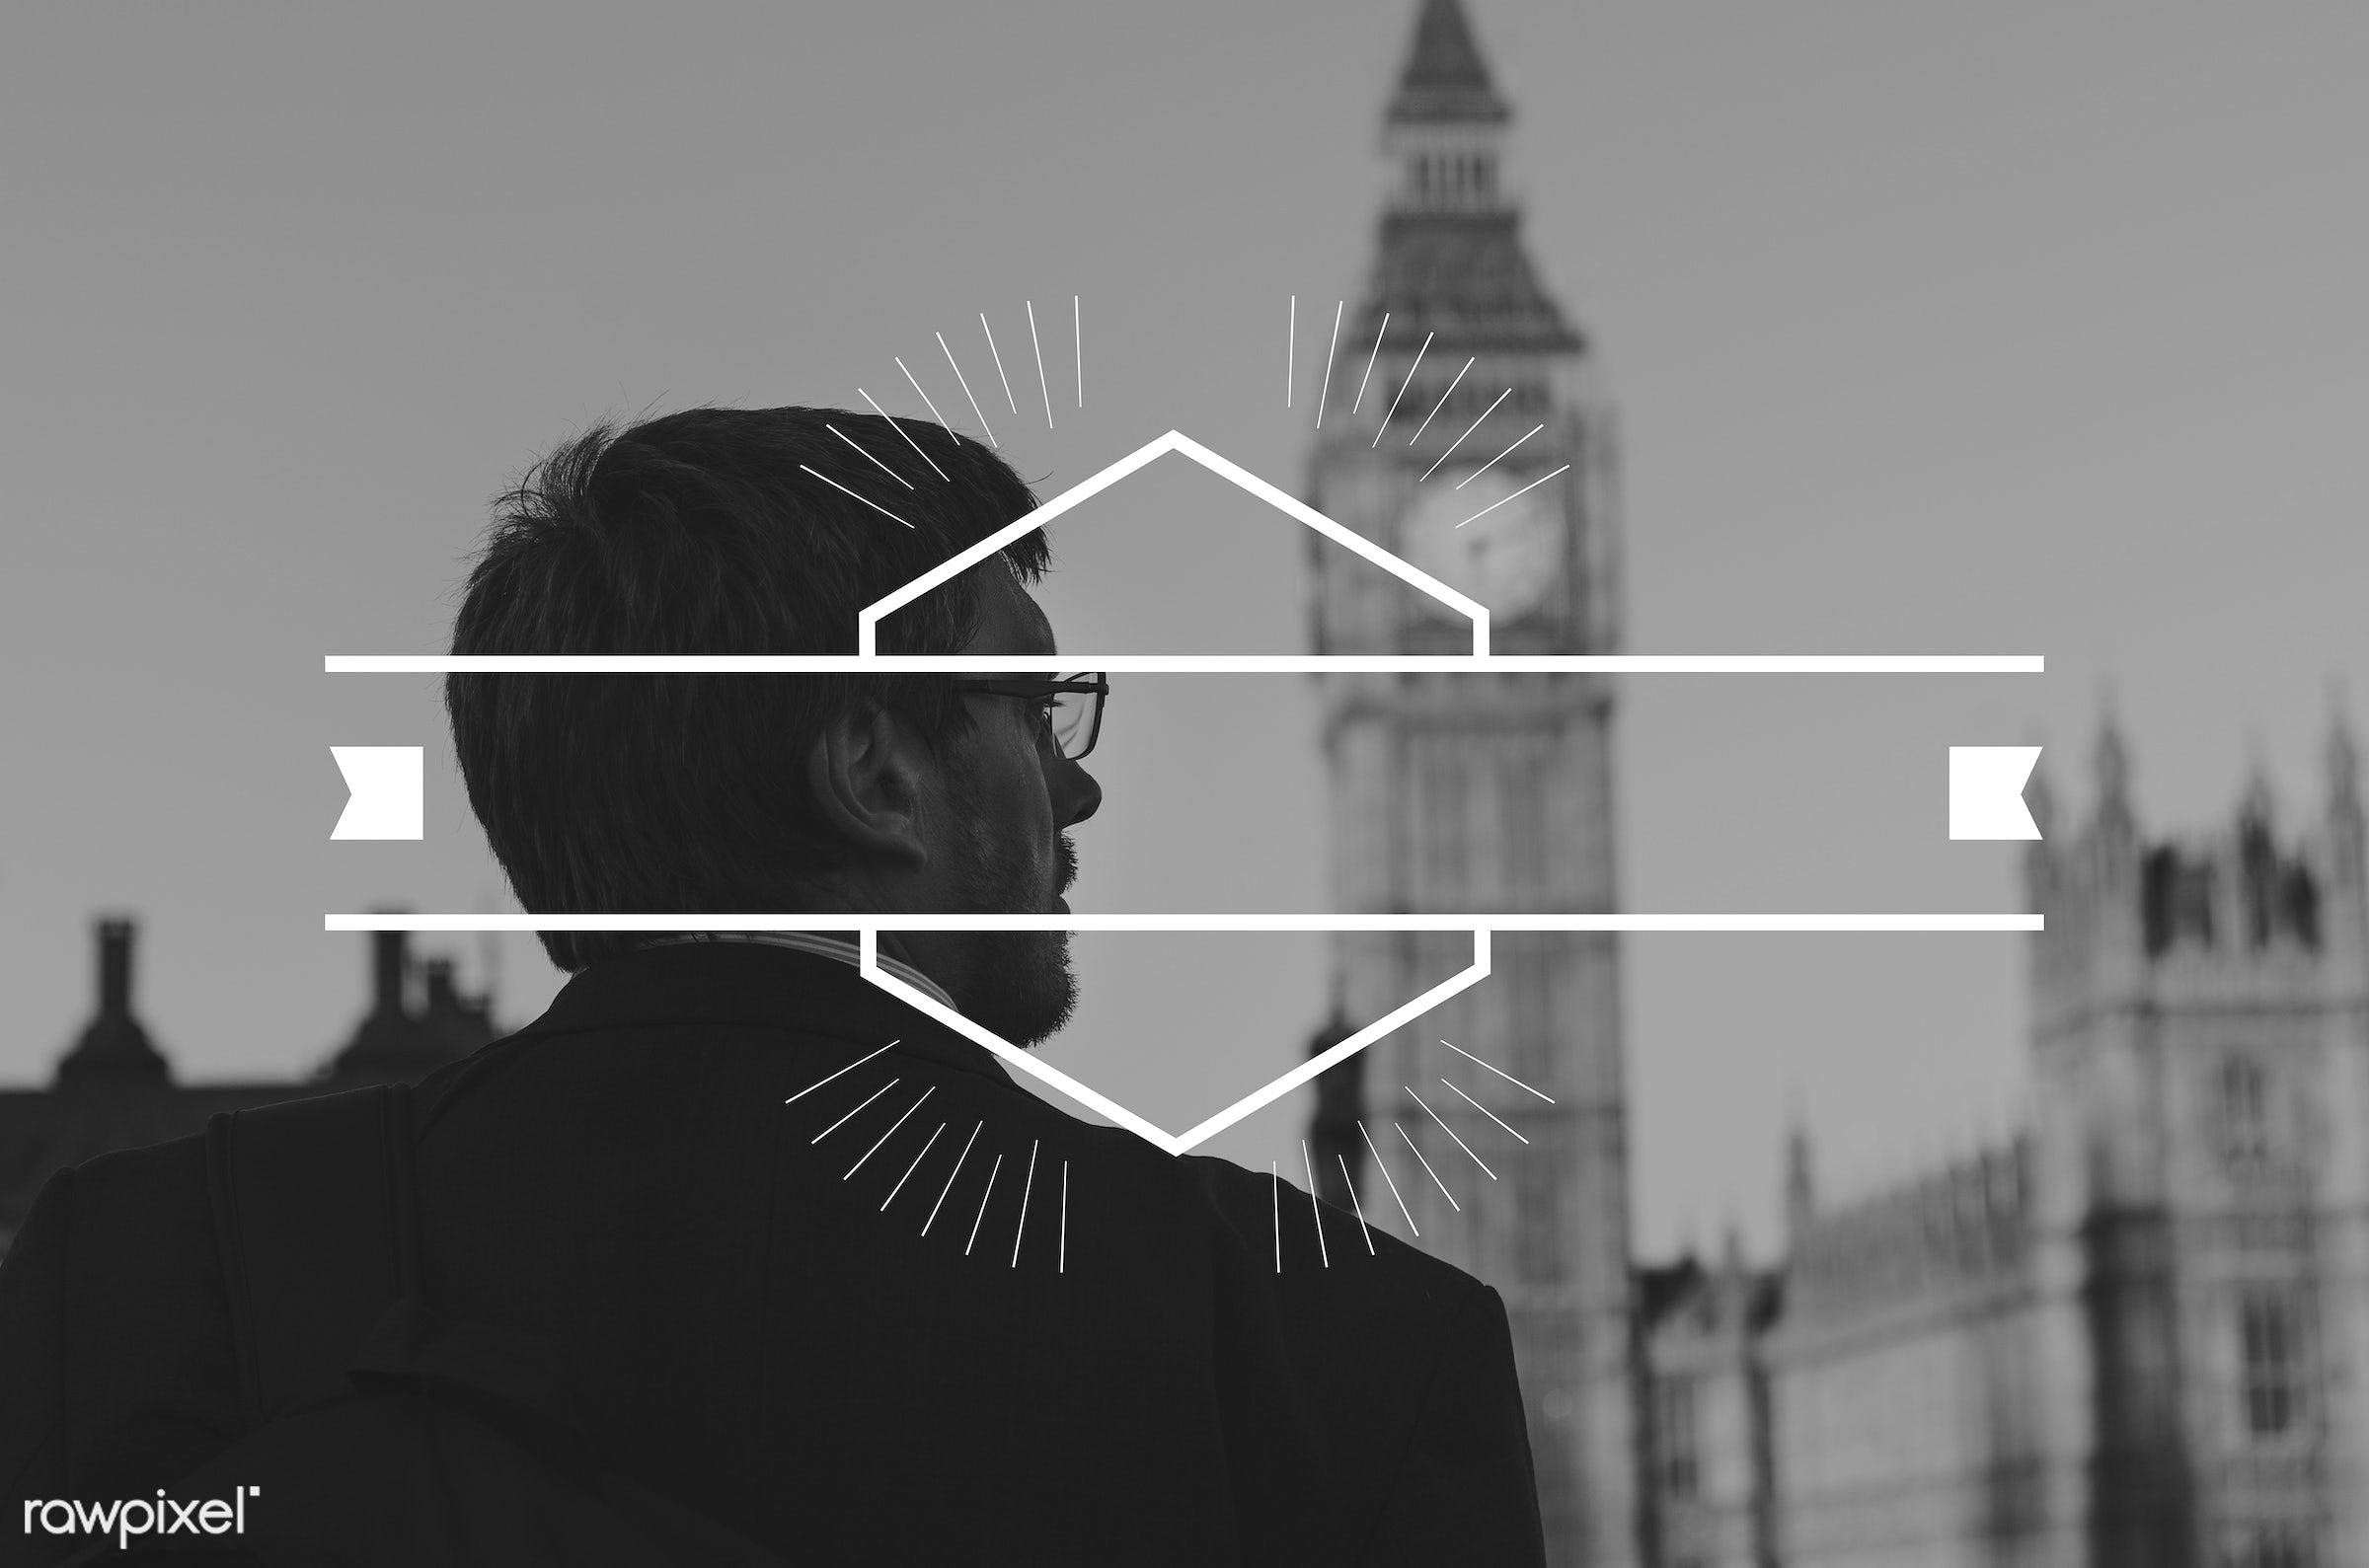 badge, banner, big ben, blank, britain, building, business, businessmen, clock, copy space, england, label, london, looking...